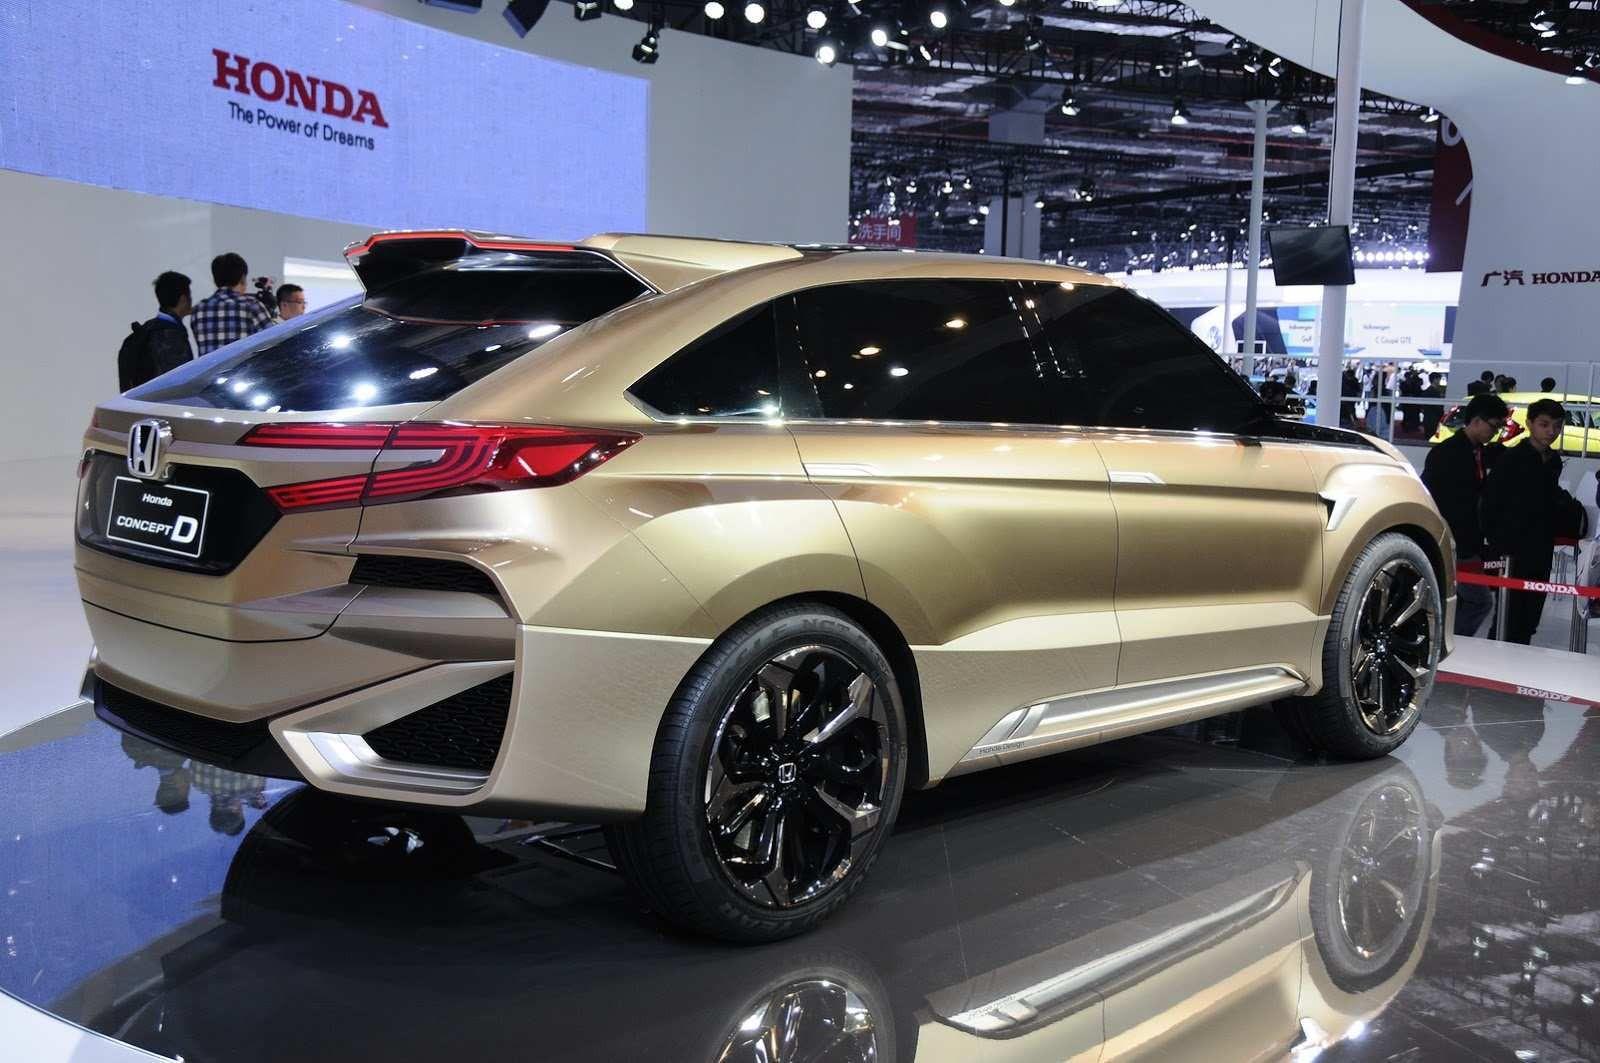 Honda Xr 2020 First Drive For Honda Xr 2020 New Review Di 2020